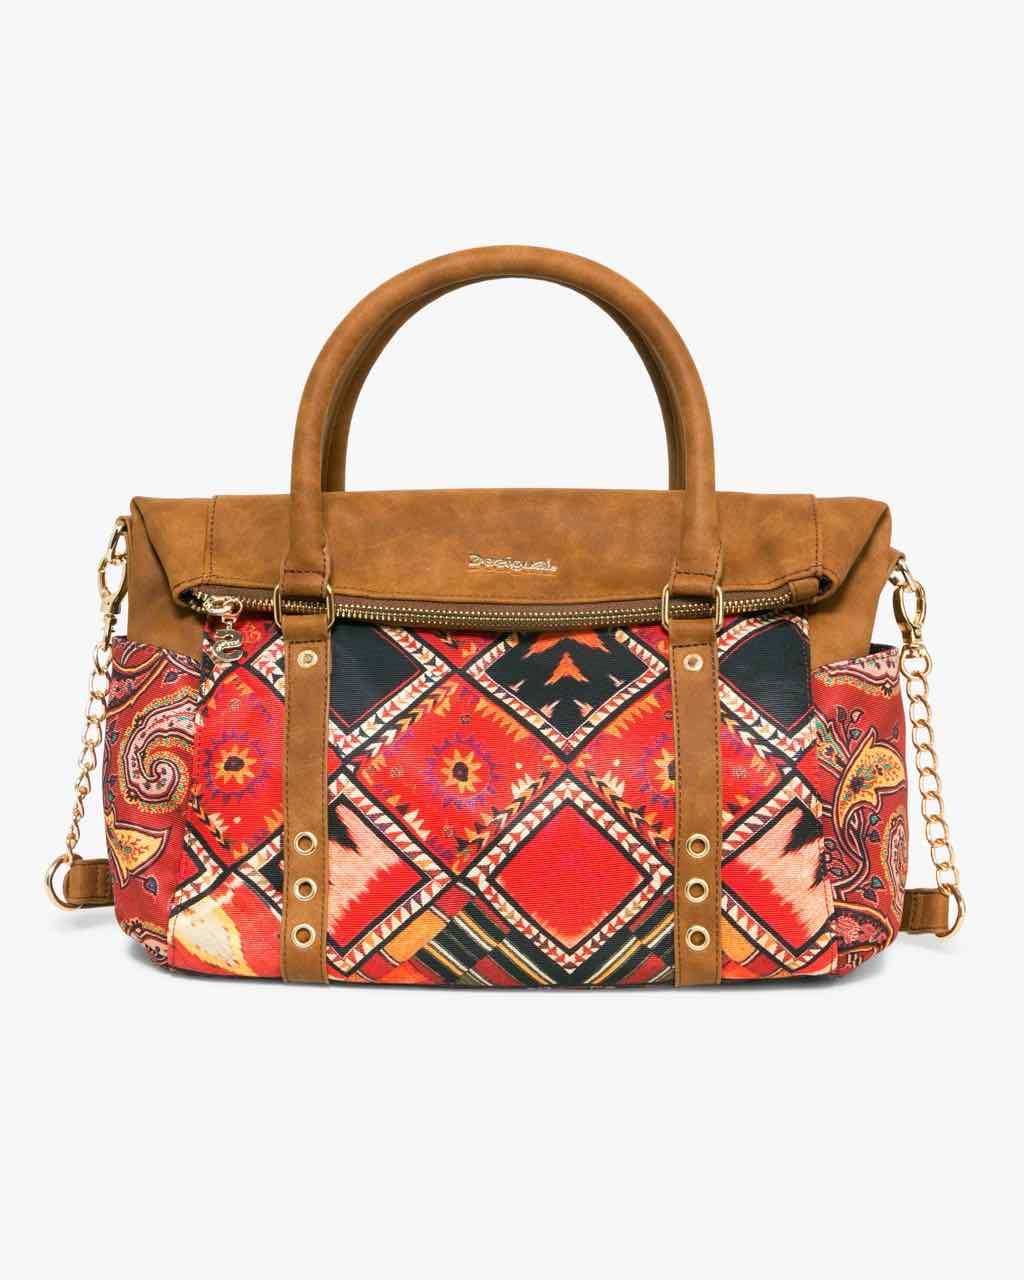 17WAXFWF_6000 Desigual Bag Loverty Boho Buy Online